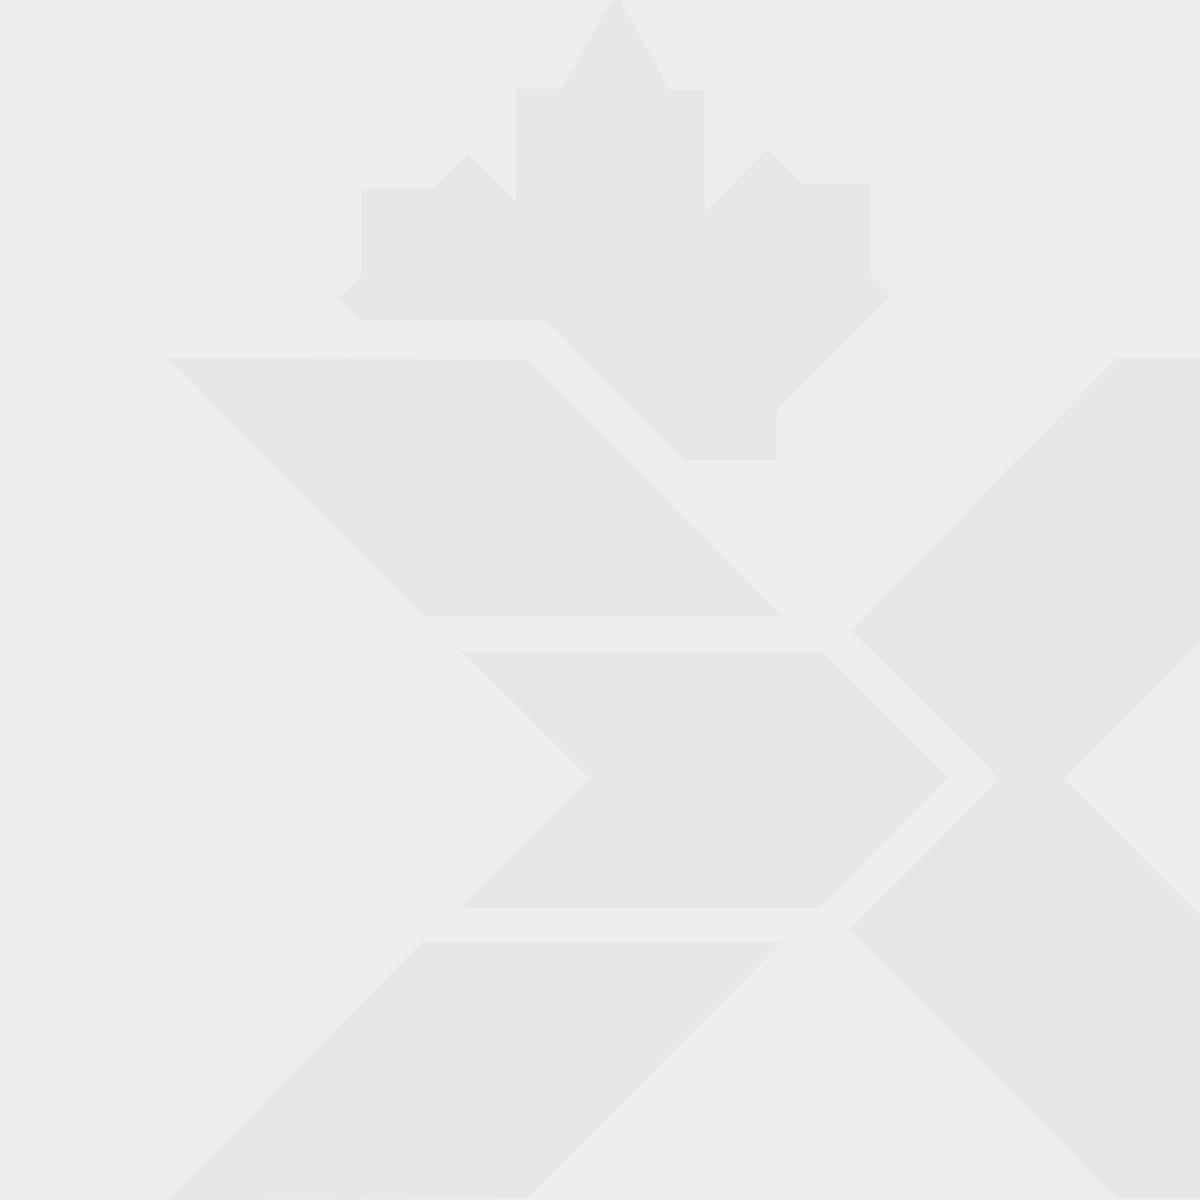 First Tactical Men's V2 Tactical Pant Black